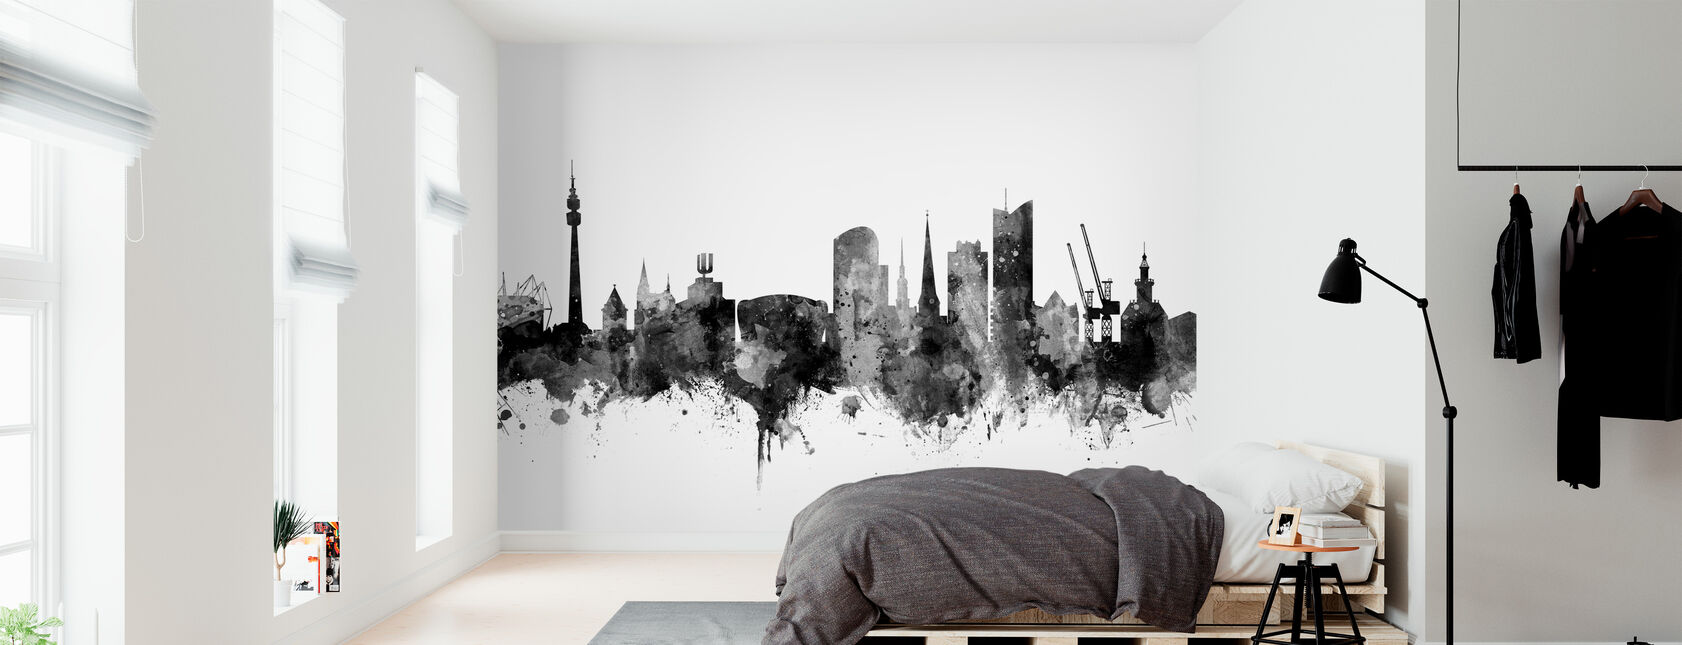 Dortmund Skyline Black - Tapete - Schlafzimmer